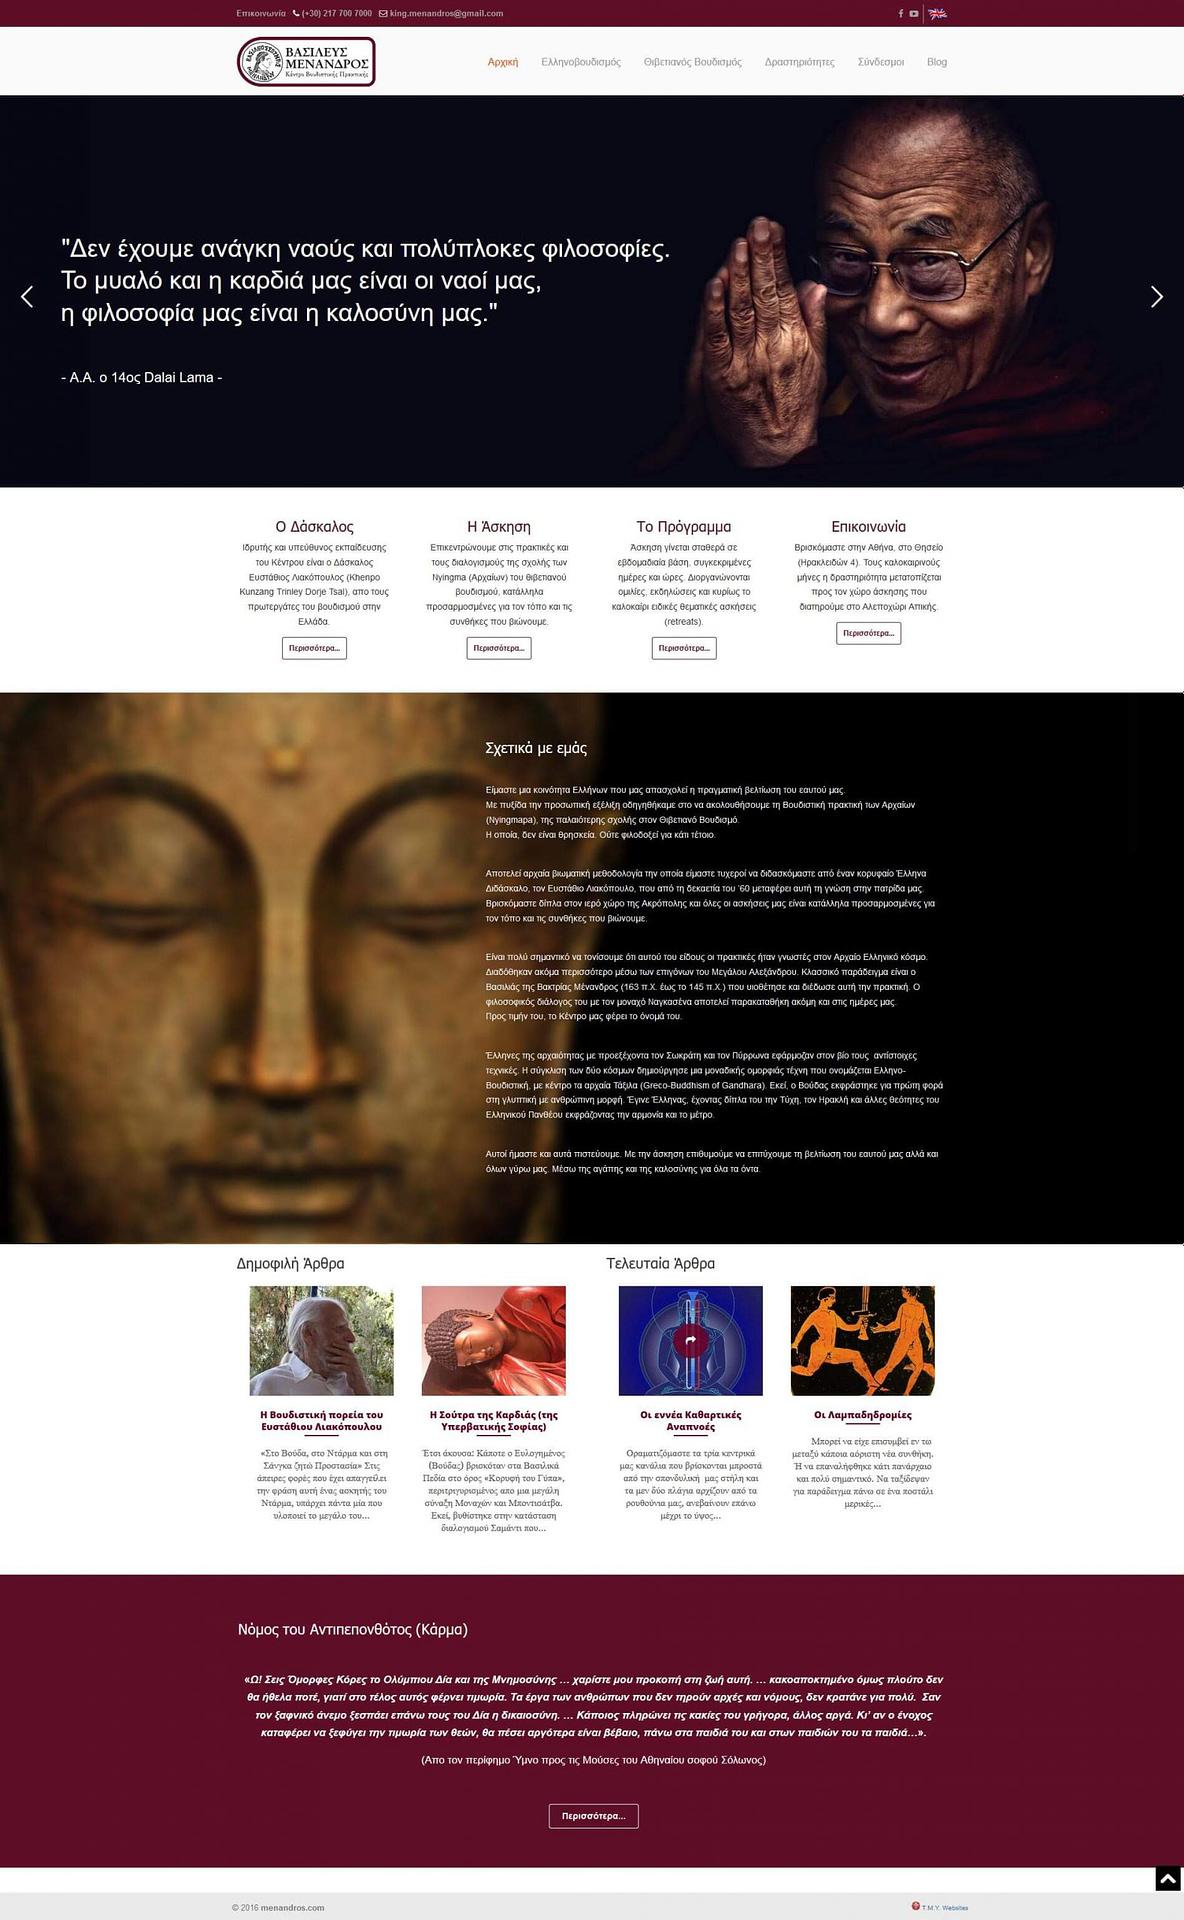 Menandros - TMY WEB Development